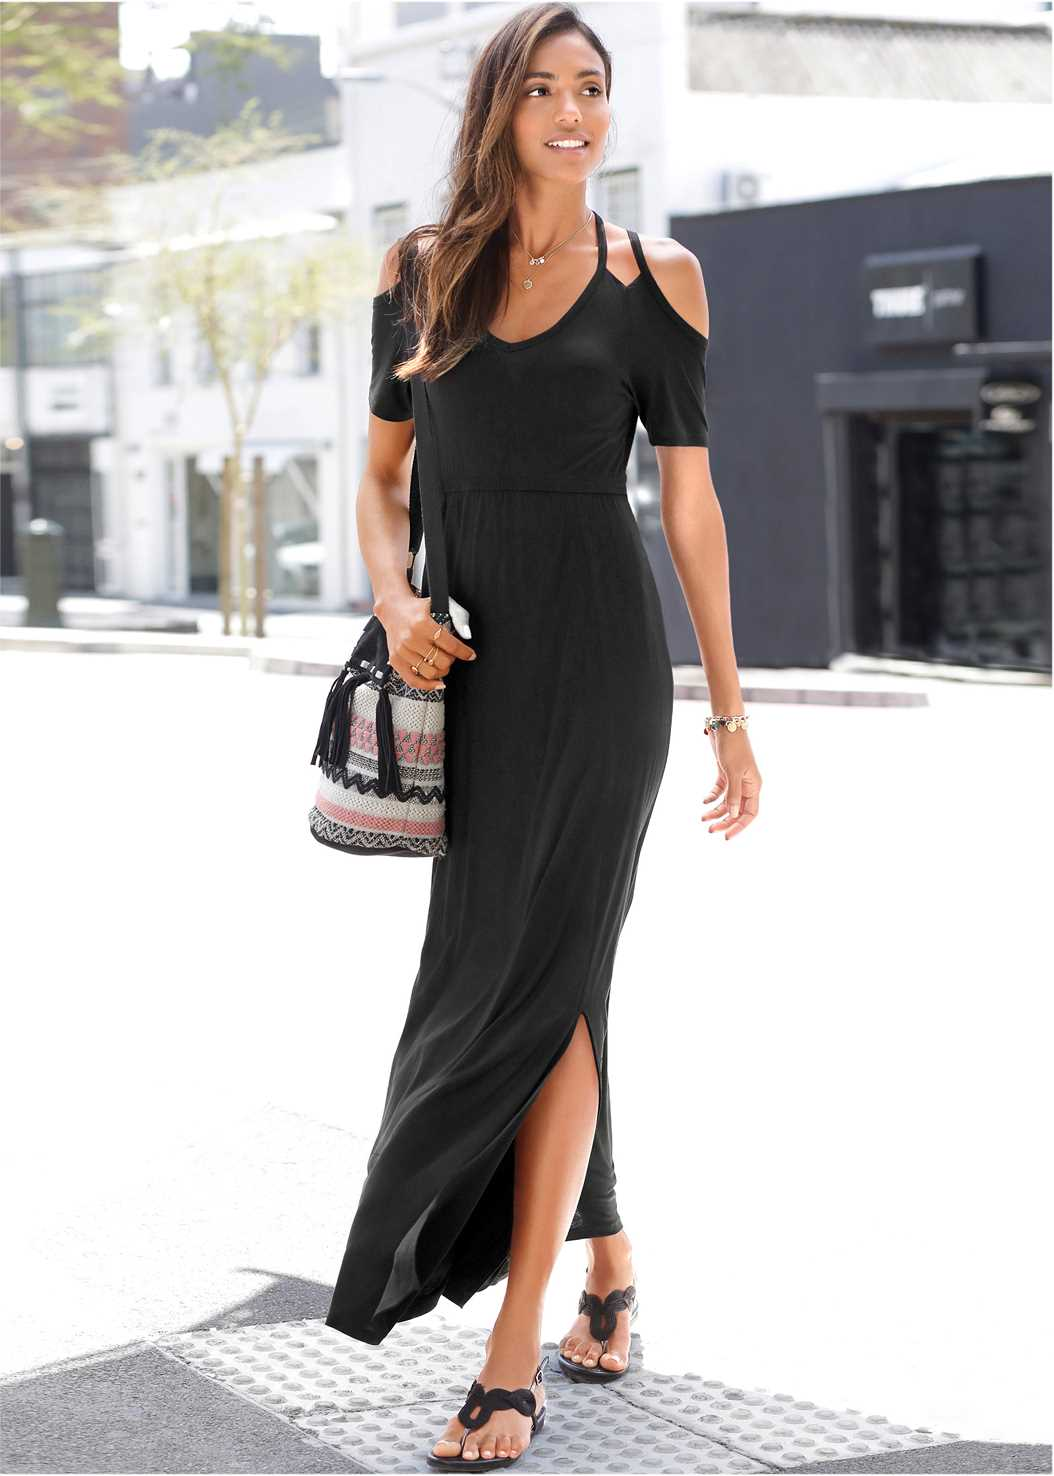 Cold Shoulder Maxi Dress,Strapless Bra,Rhinestone Thong Sandal,Sequin Straw Crossbody Bag